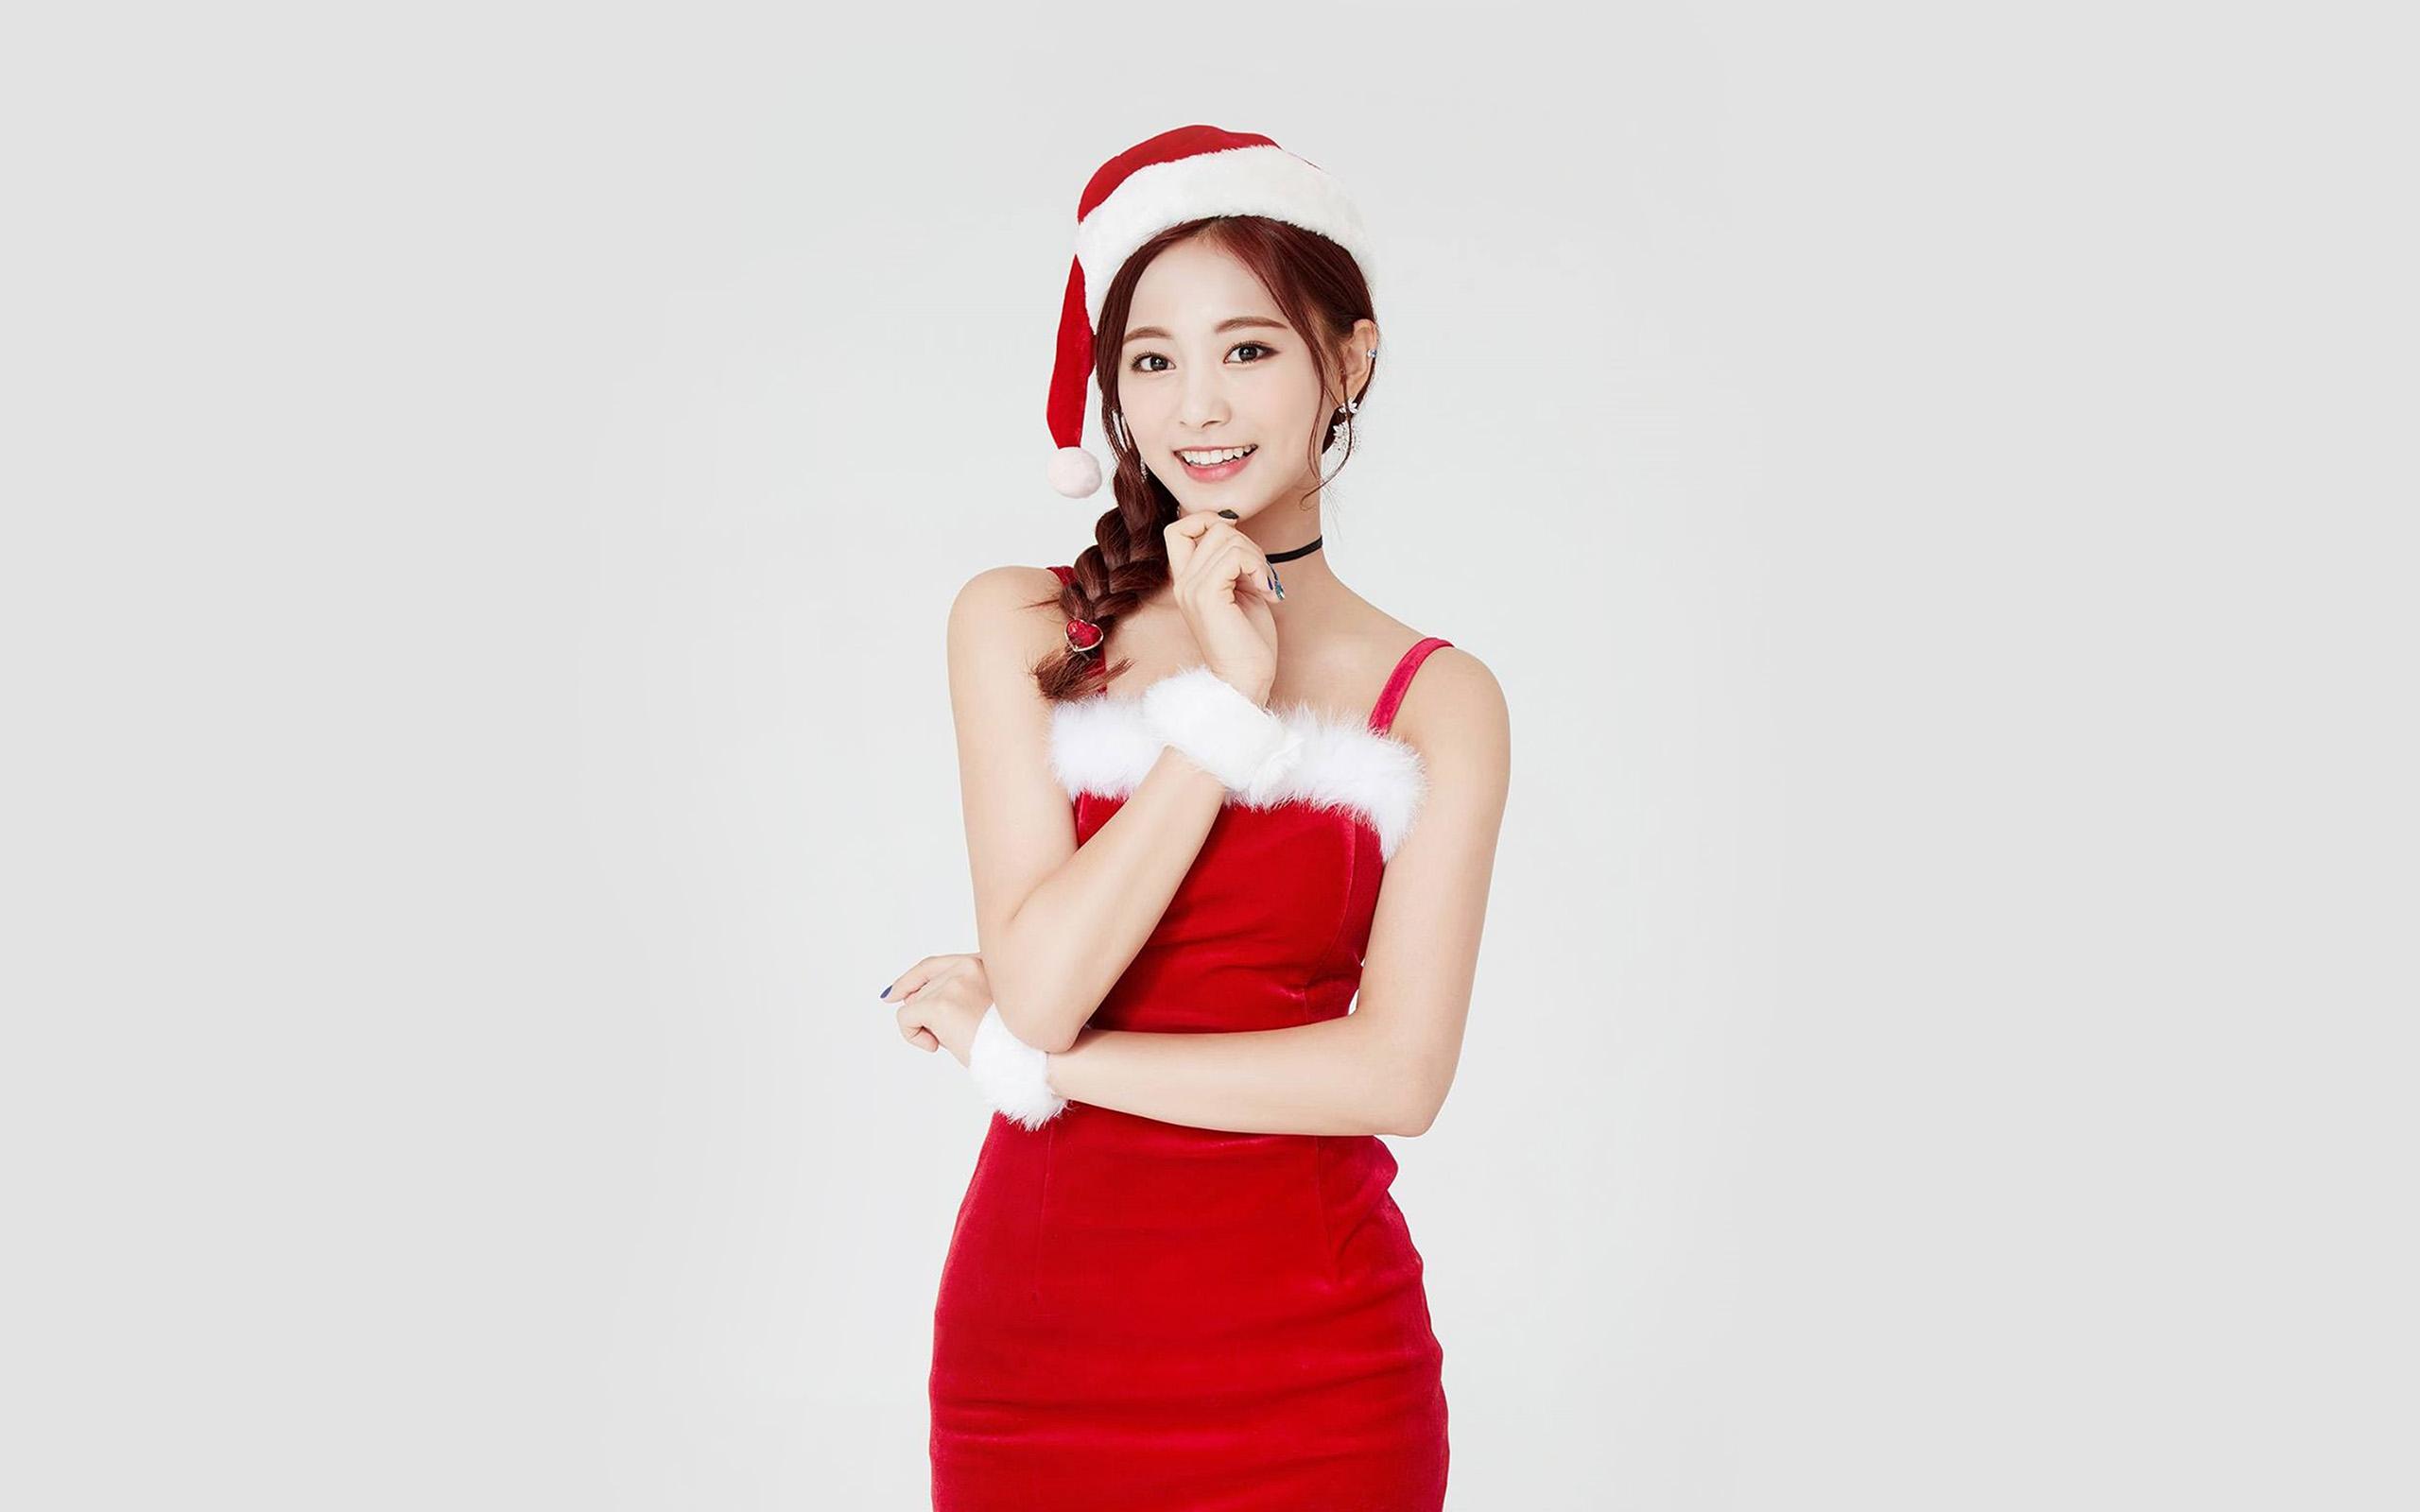 Cute Apple Logo Wallpaper Hp14 Twice Tzuyu Girl Christmas Kpop Wallpaper